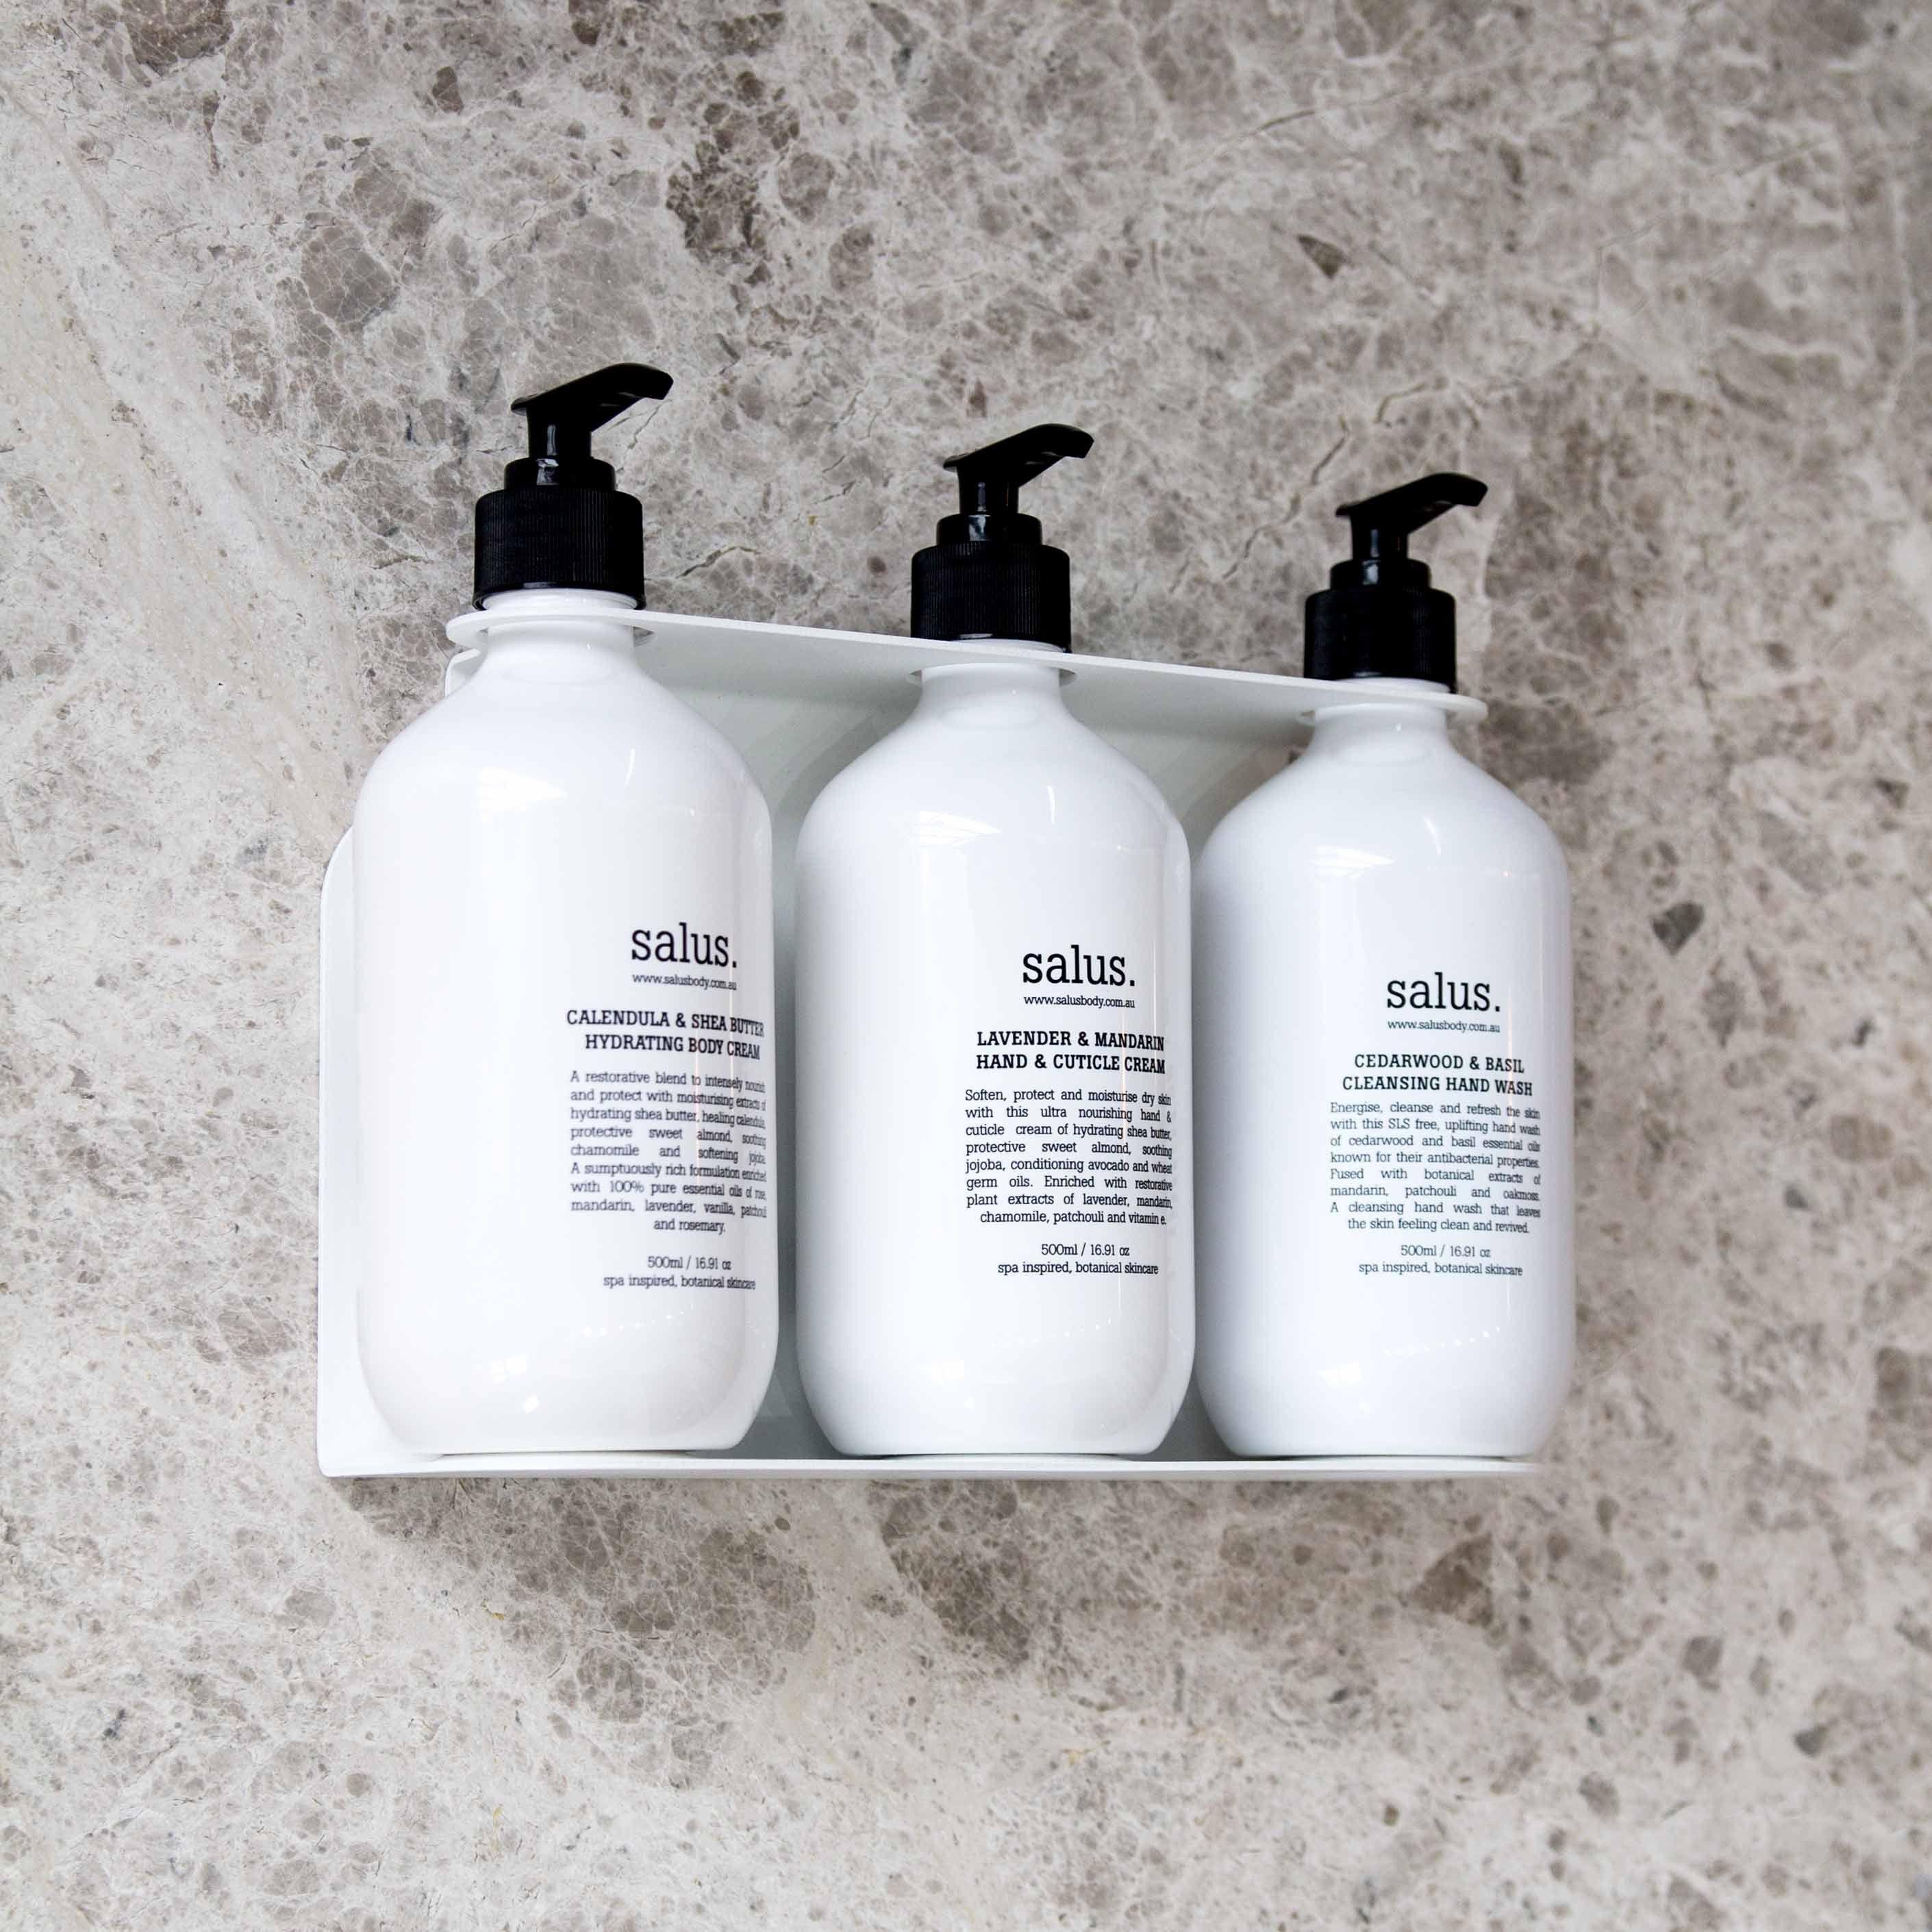 Designstuff Offers A Wide Range Of Scandinavian Homewares Including This Minimalist Triple Soap Dispen Soap Dispenser Design Soap Dispenser Soap Dispenser Wall